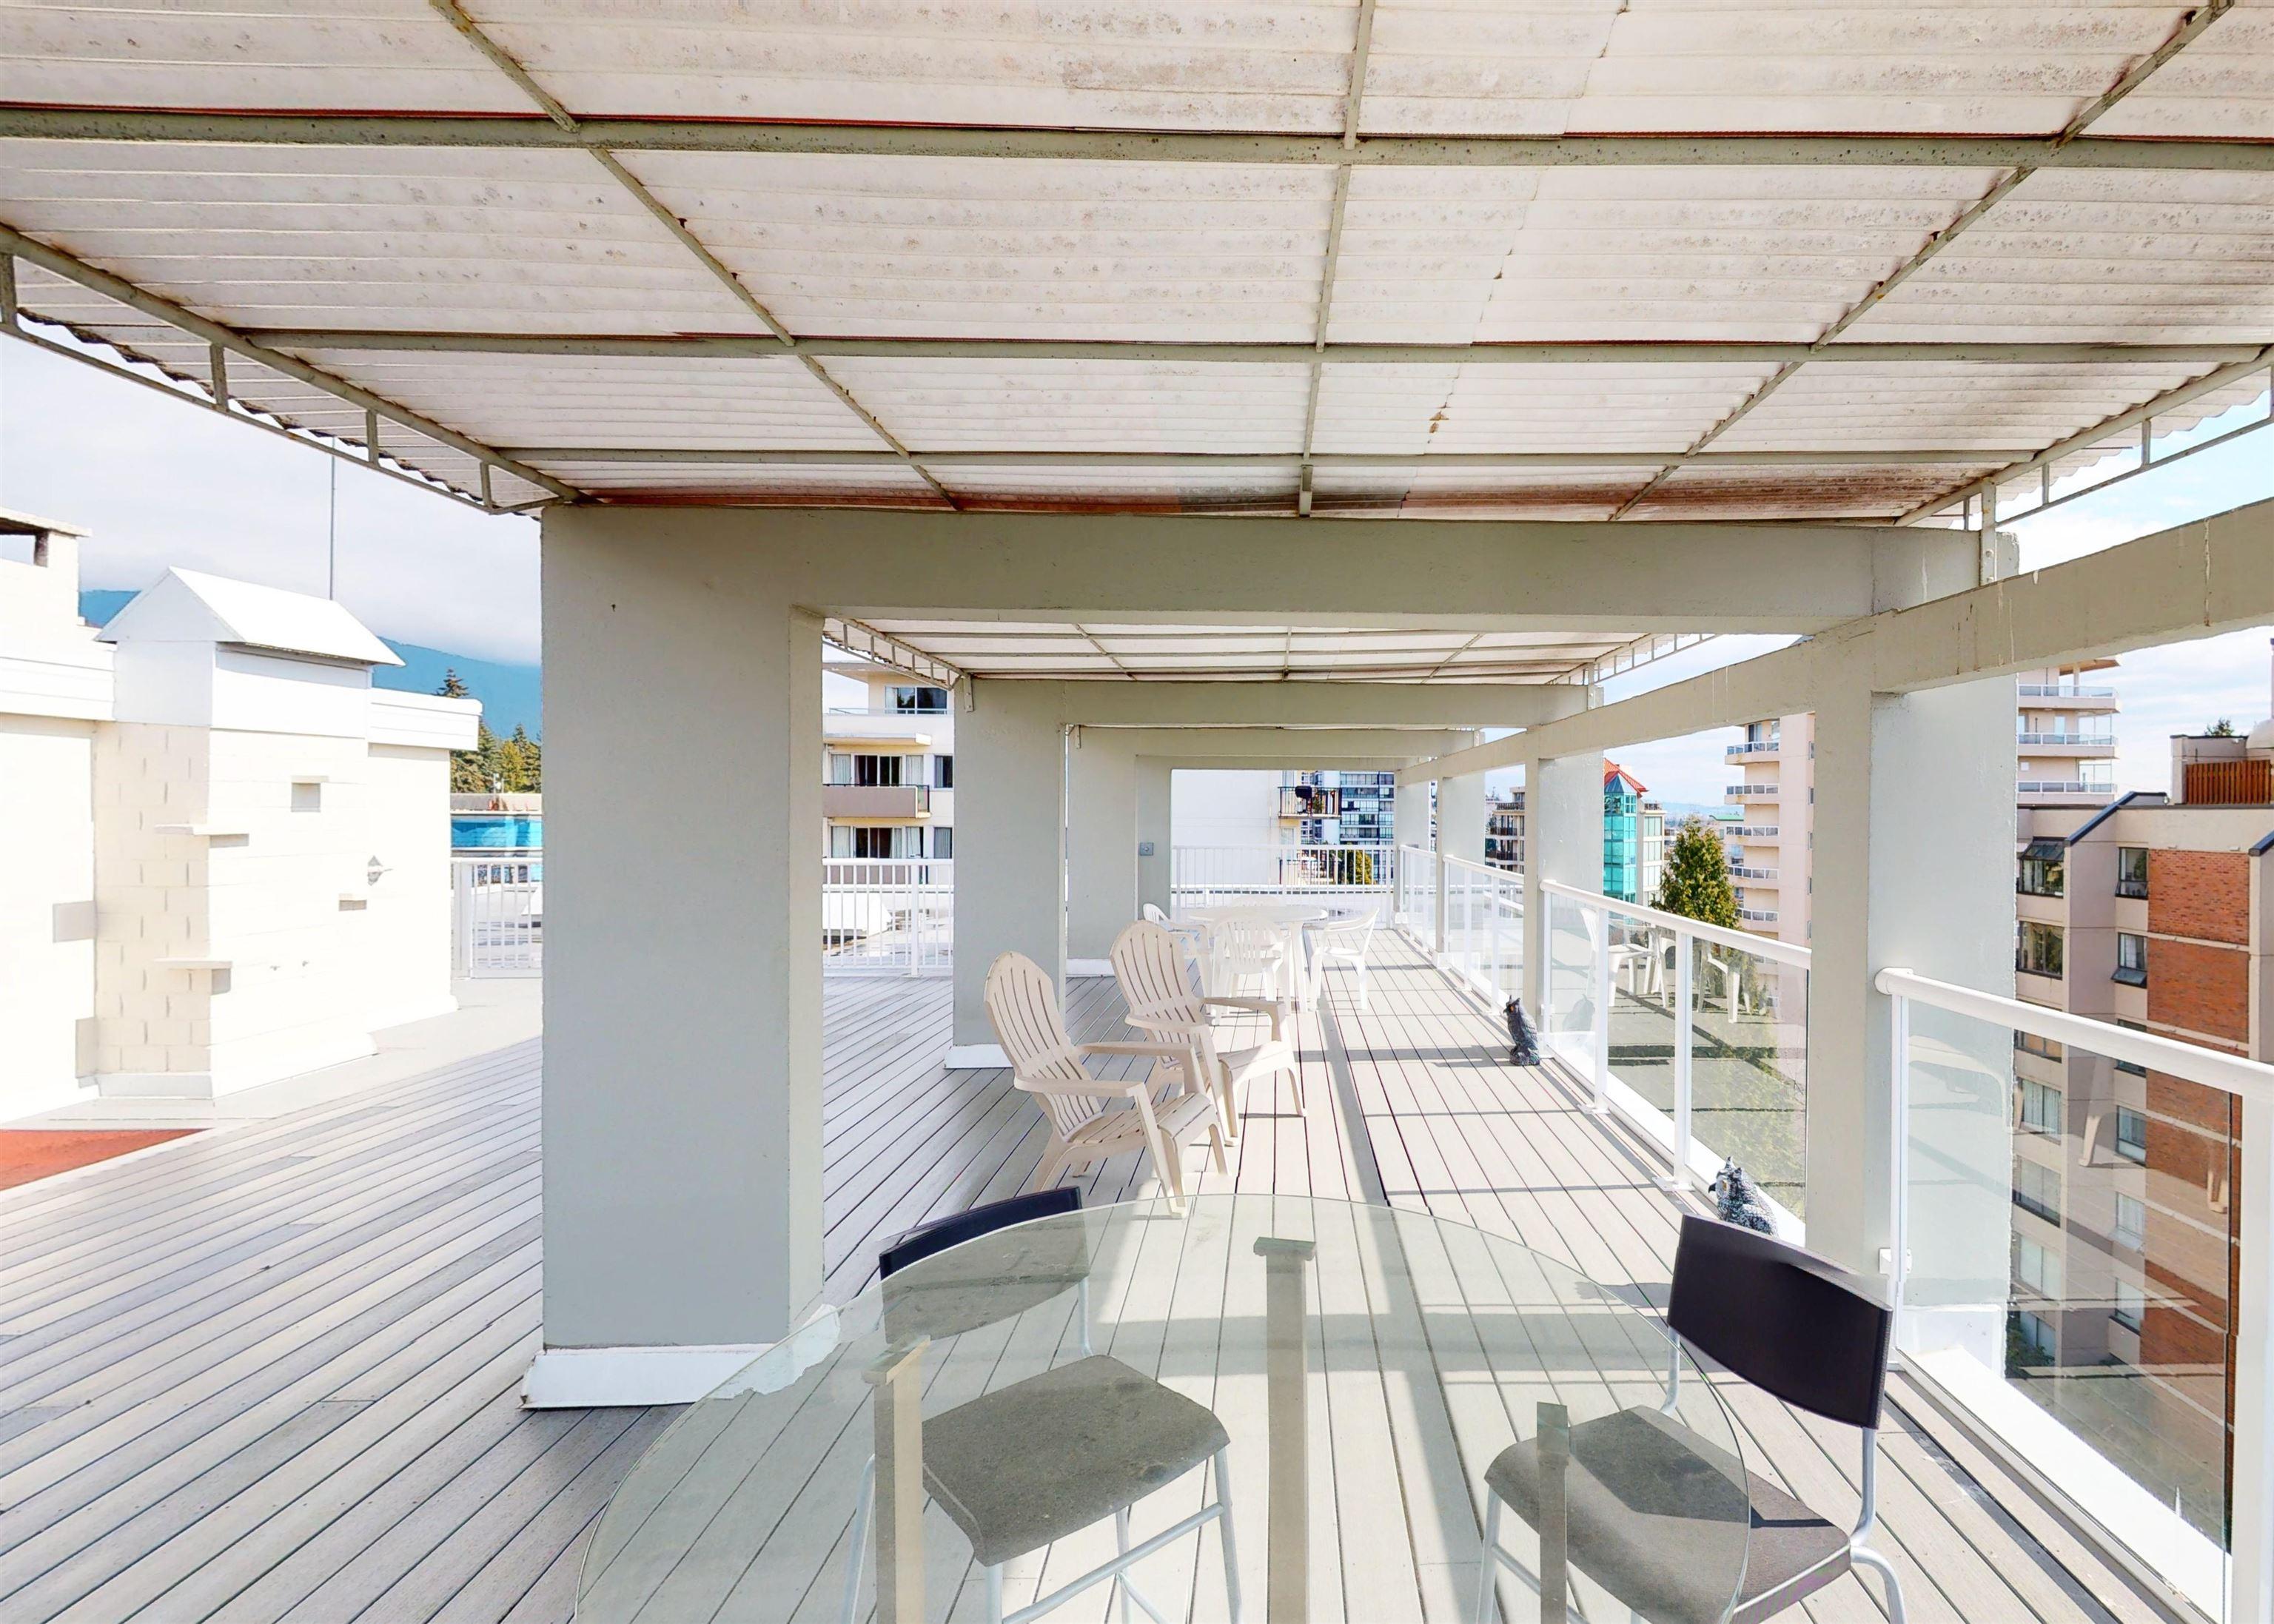 202 1750 ESQUIMALT AVENUE - Ambleside Apartment/Condo for sale, 1 Bedroom (R2610188) - #5